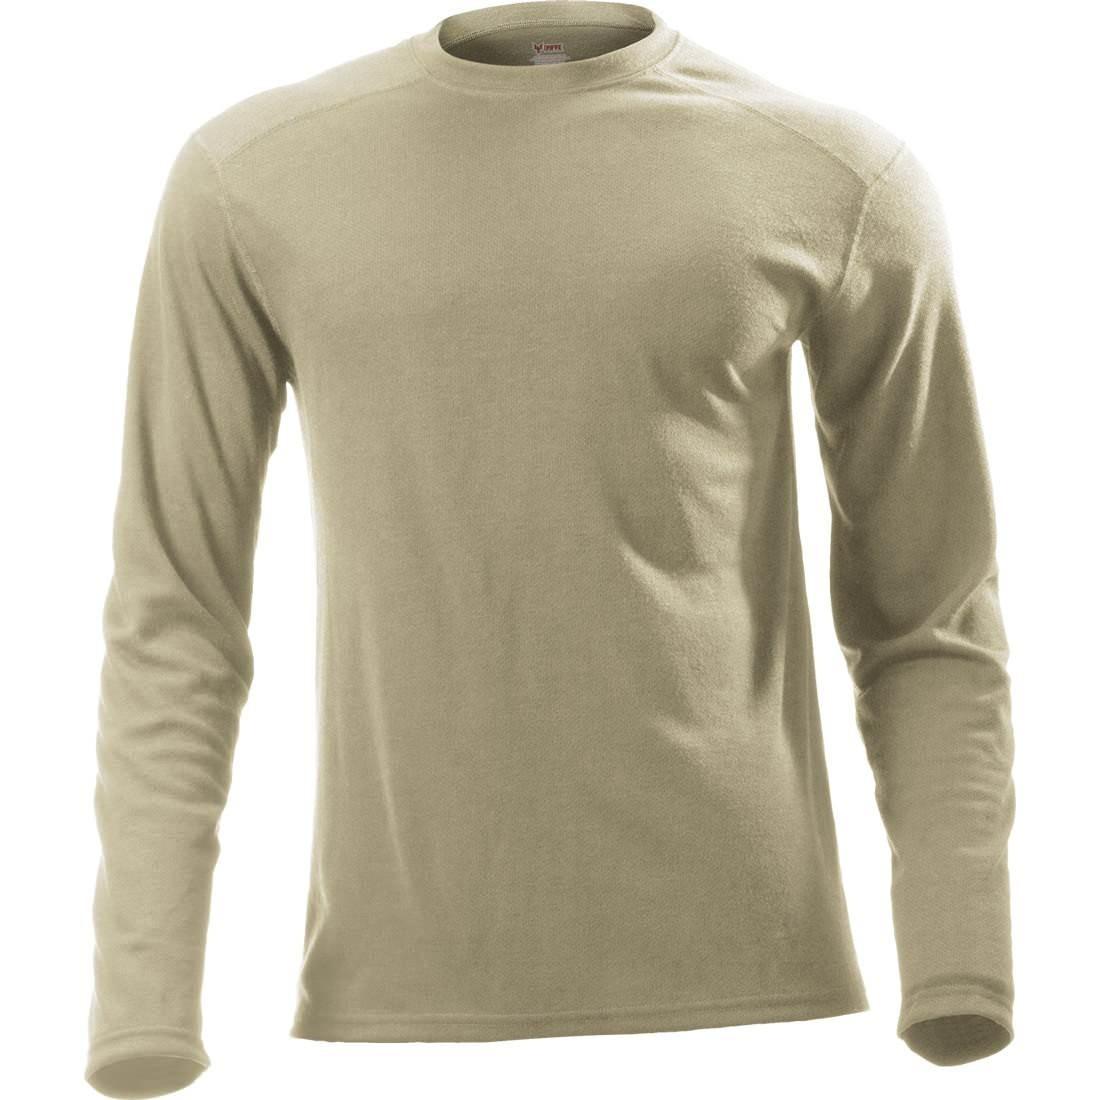 T-Shirt Hoody Sweatshirt DODGE RAM 1500 3500 Pick-Up Cult V8 Mopar S-5XL